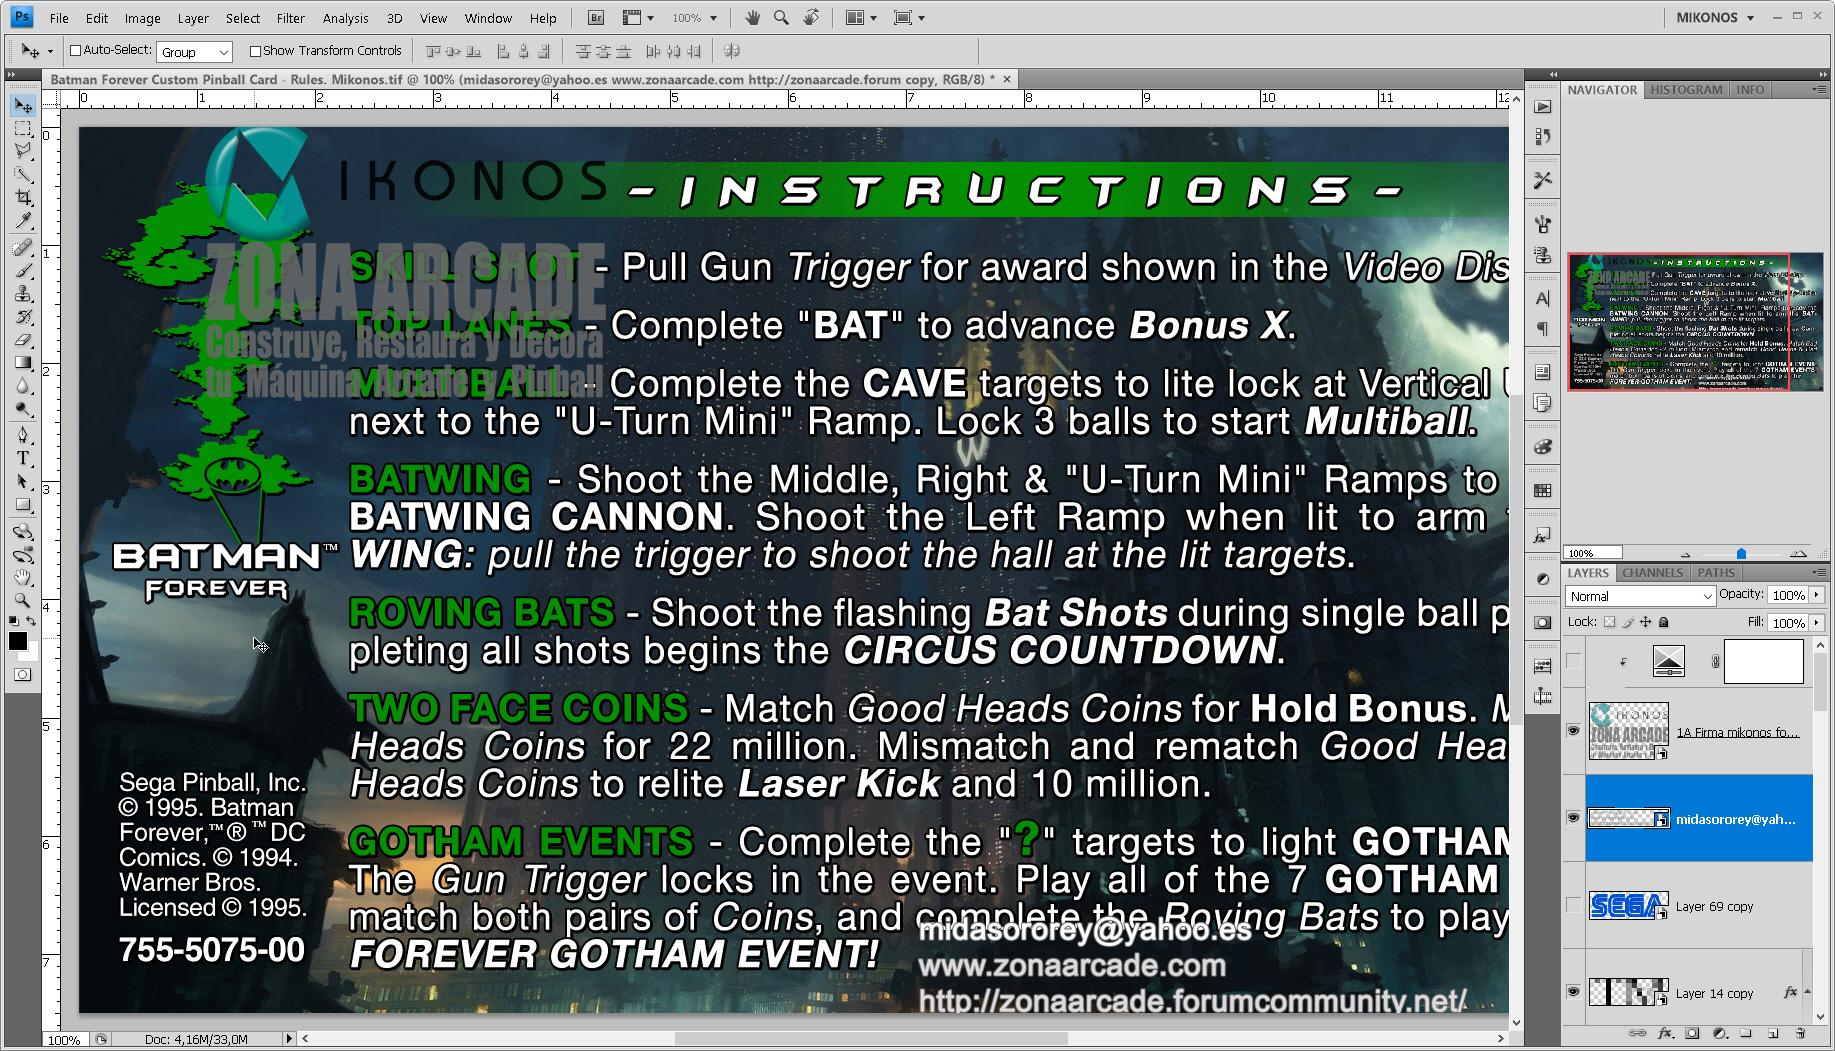 Batman%20Forever%20Custom%20Pinball%20Card%20-%20Rules.%20Mikonos2.jpg